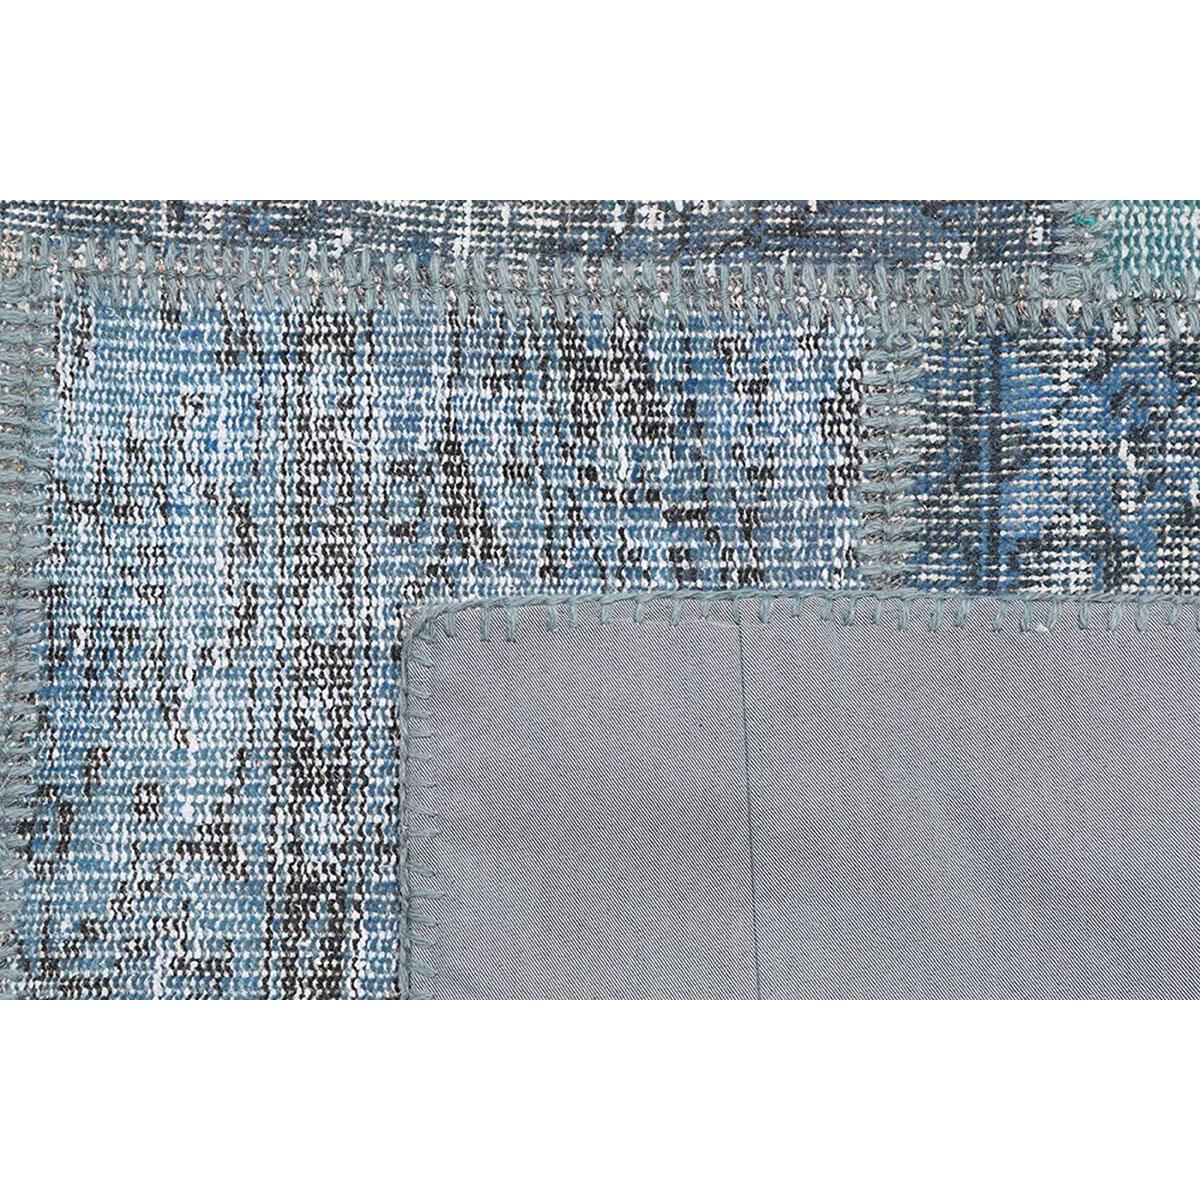 Tappeto Anatolian patchwork in lana, grigio, 60x200 - 6